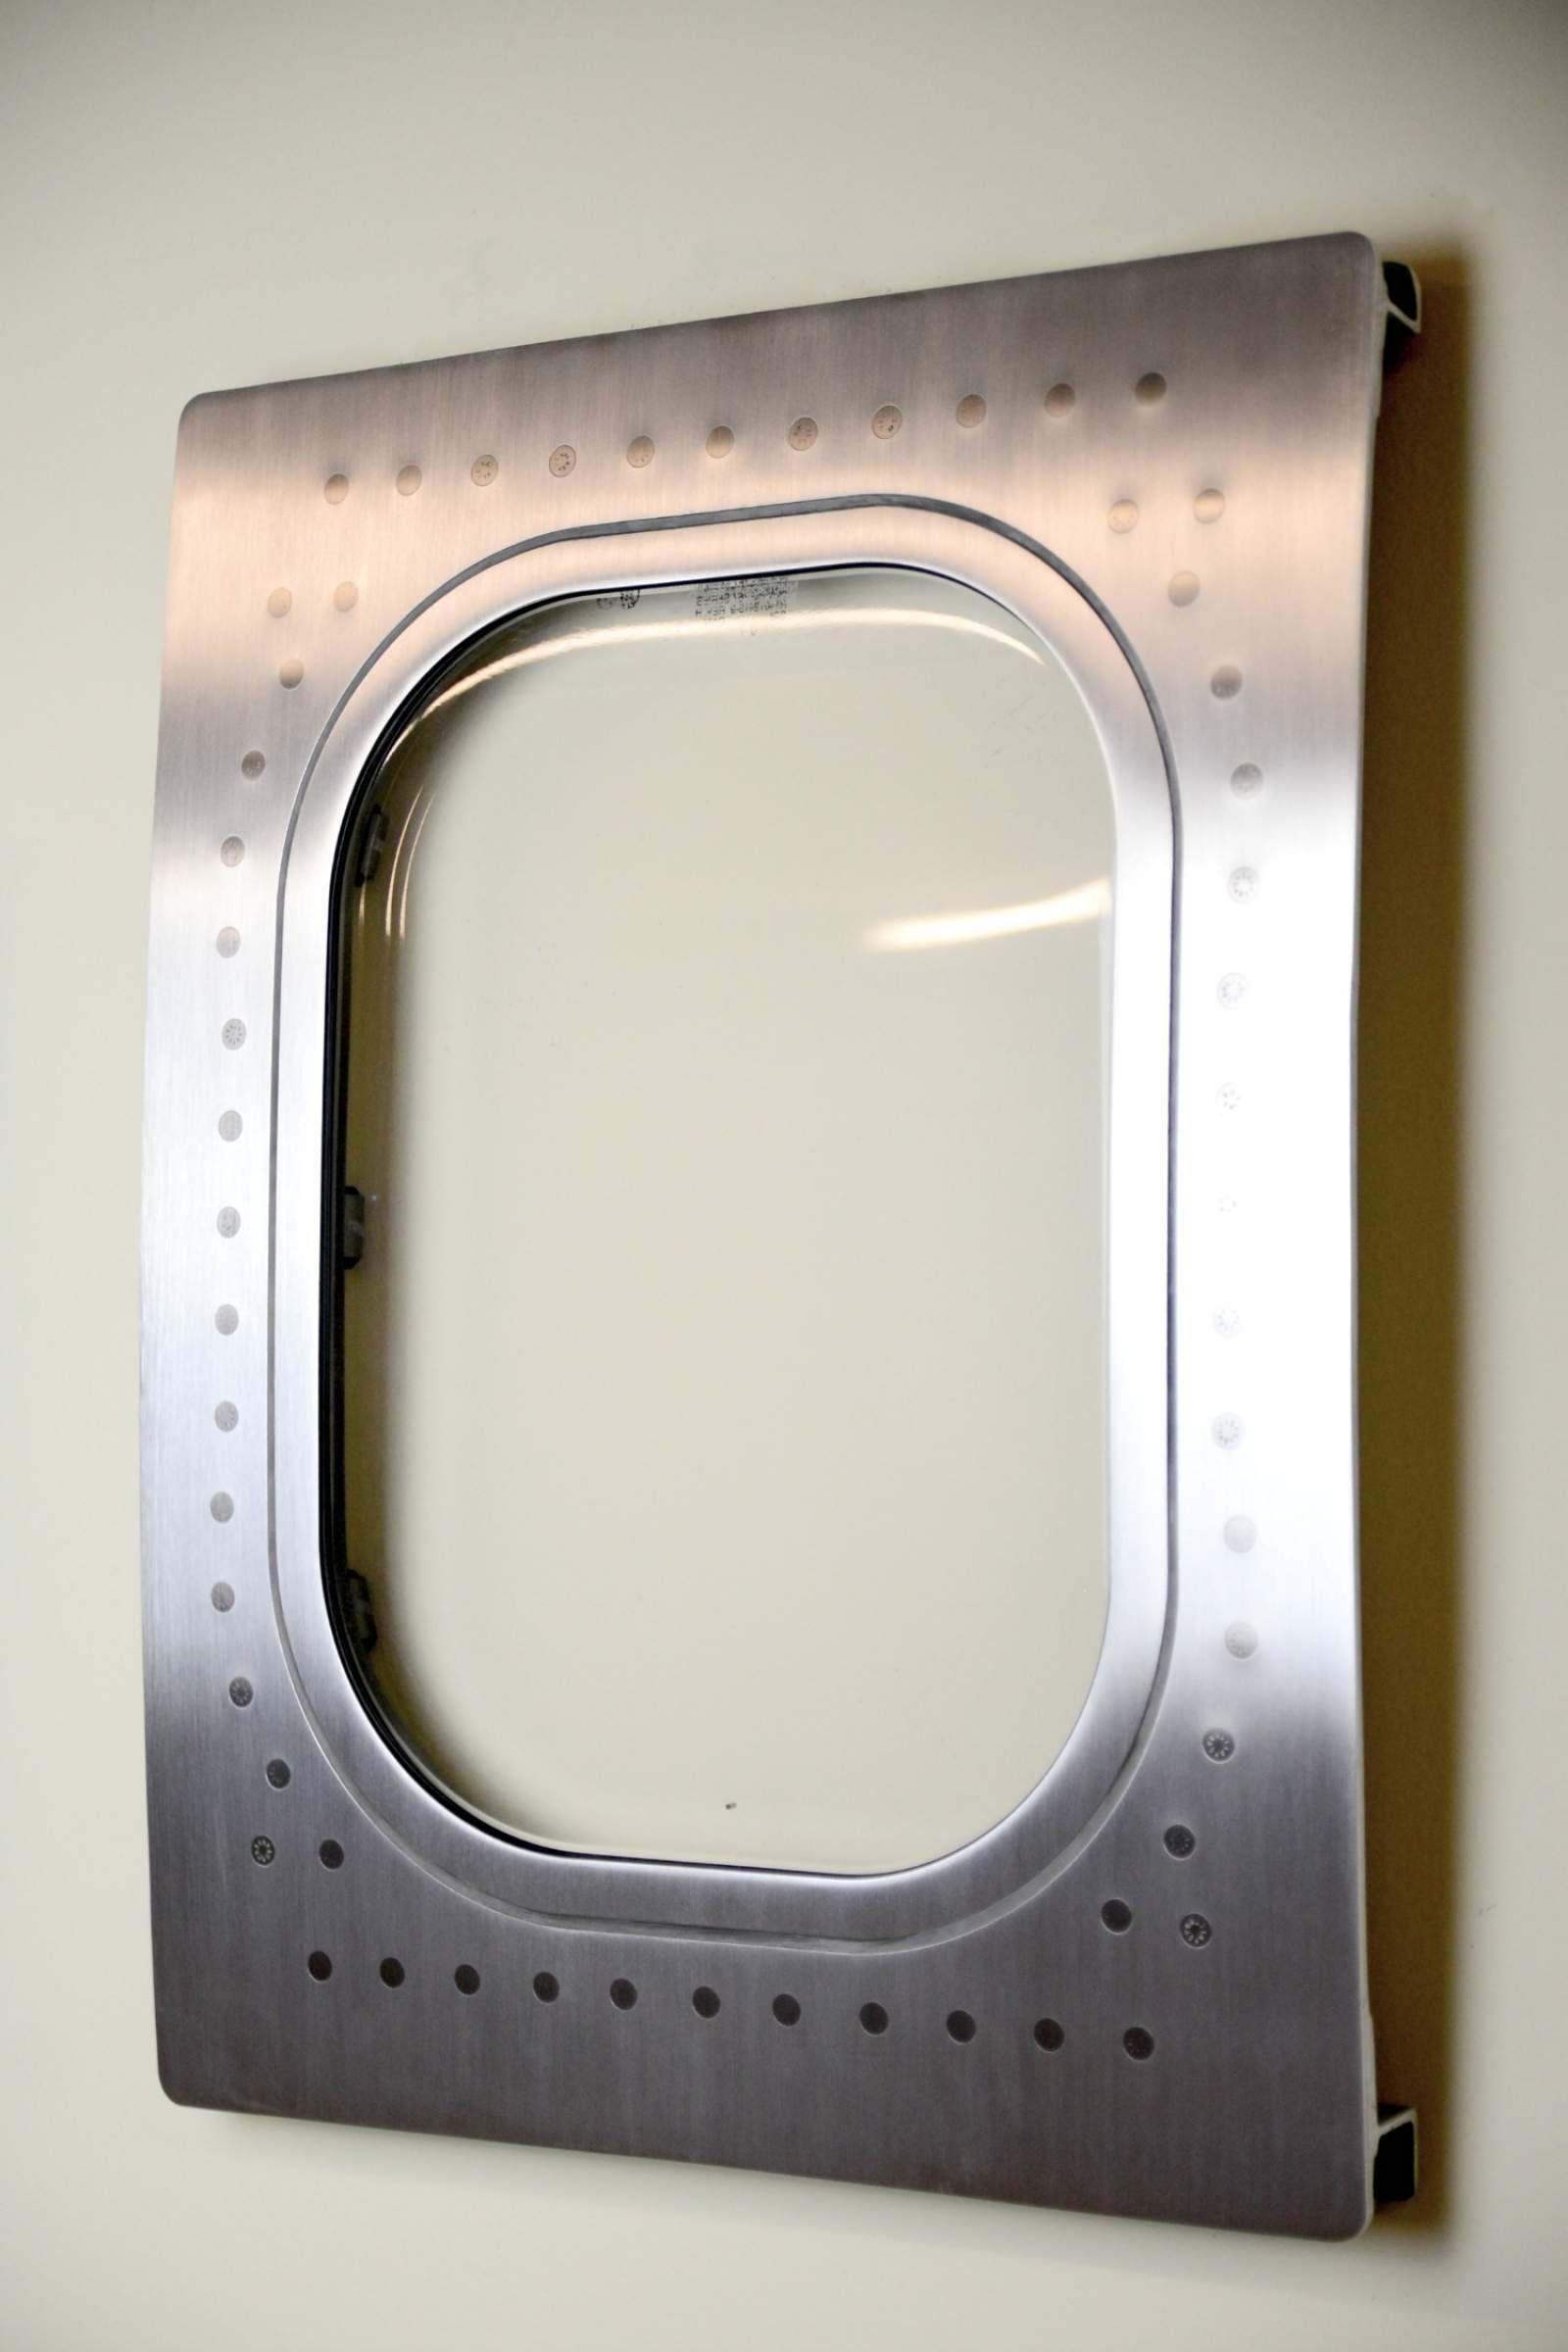 767 Wall Art Brushed Finish | John | Pinterest | Walls, Aviation Regarding Aviation Wall Art (Photo 7 of 20)